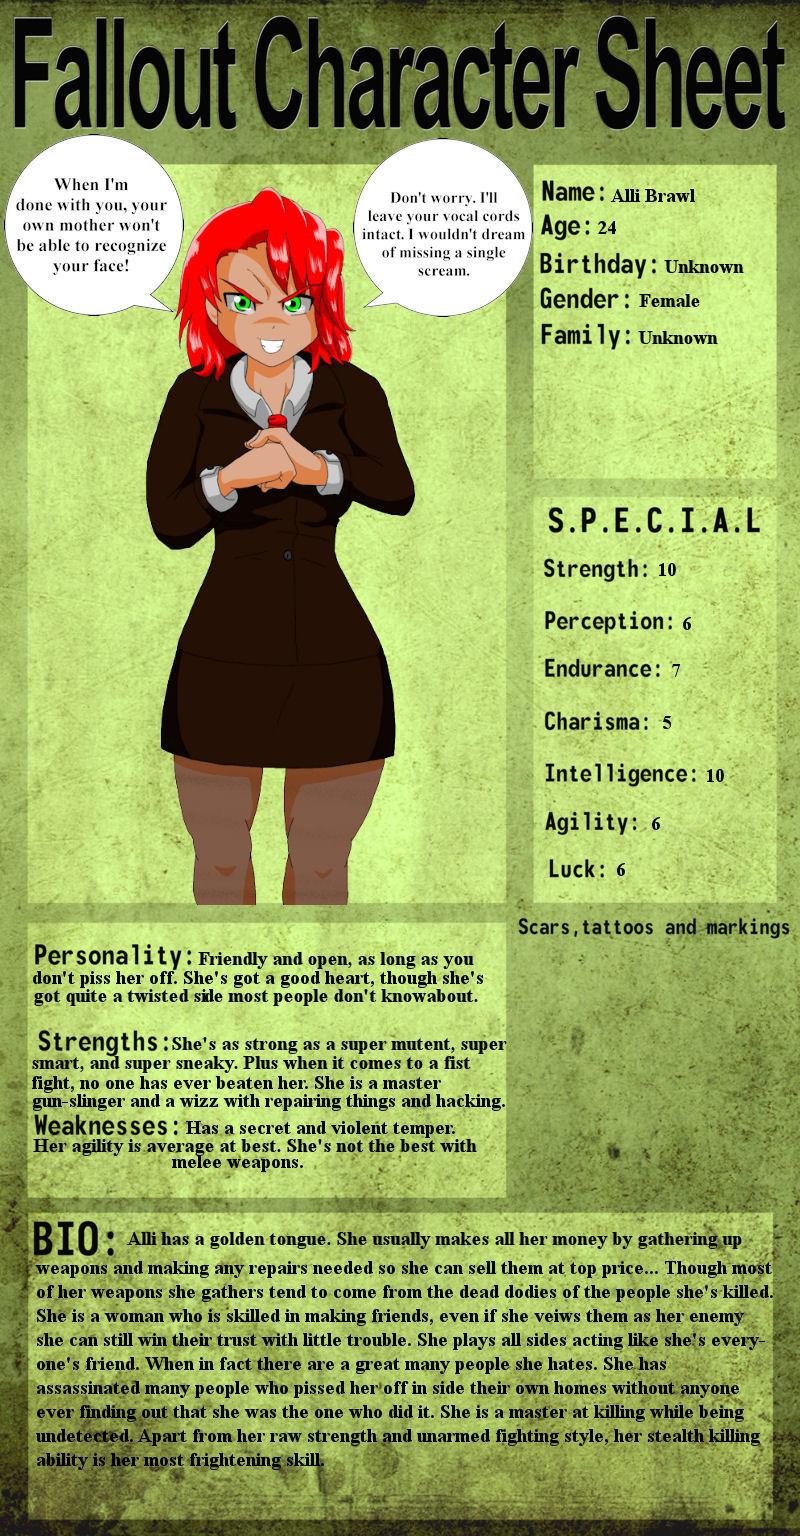 Fallout 4 katsu god - 1 part 2